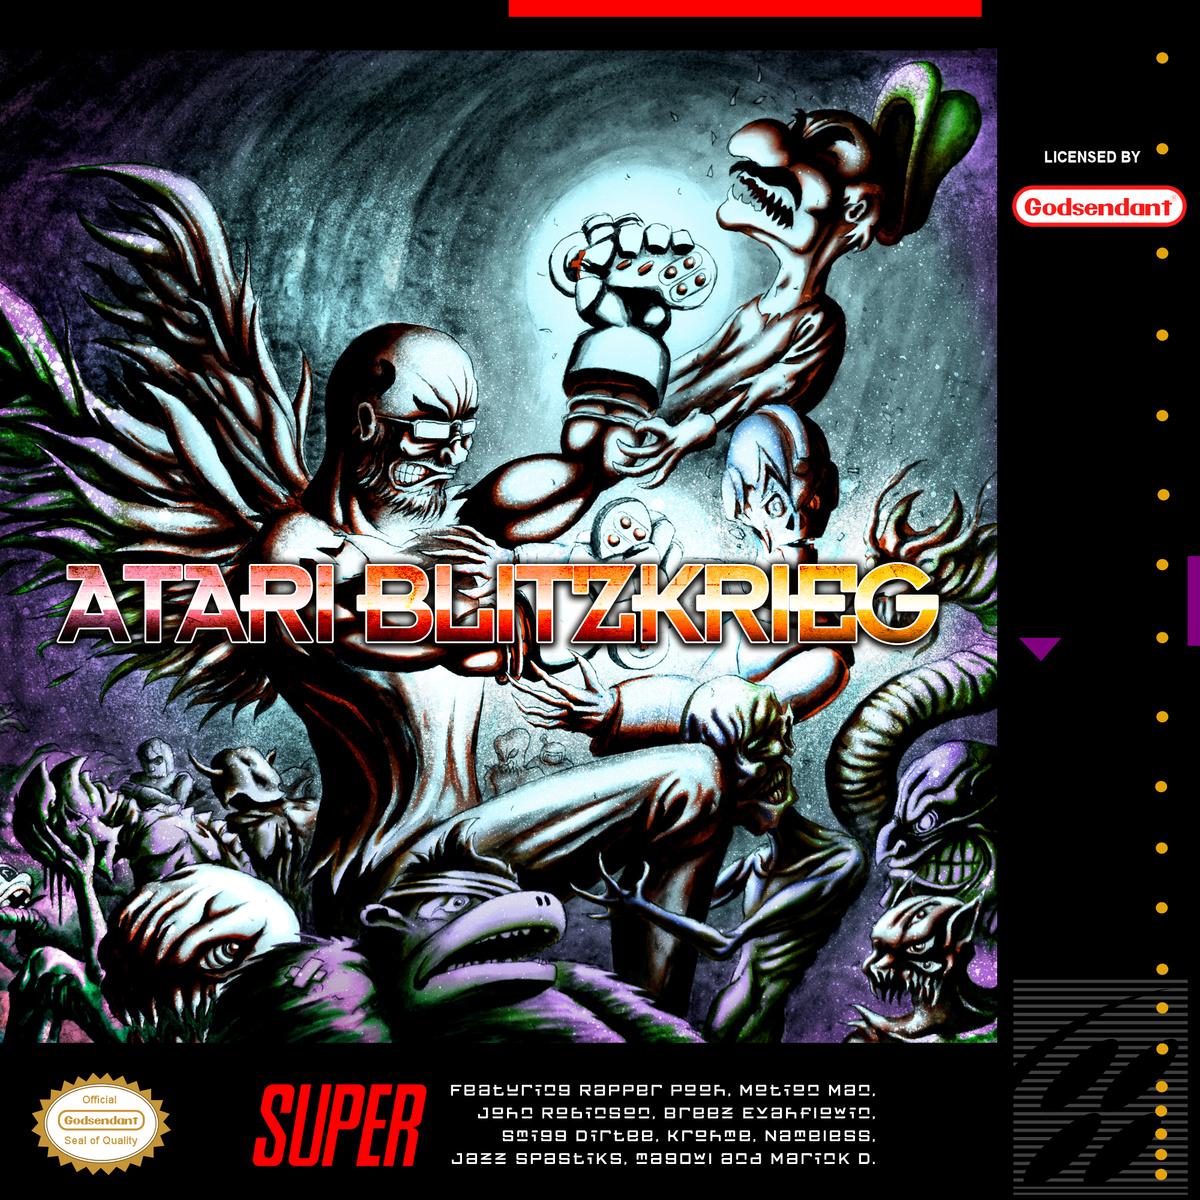 Atari Blitzkrieg - Super